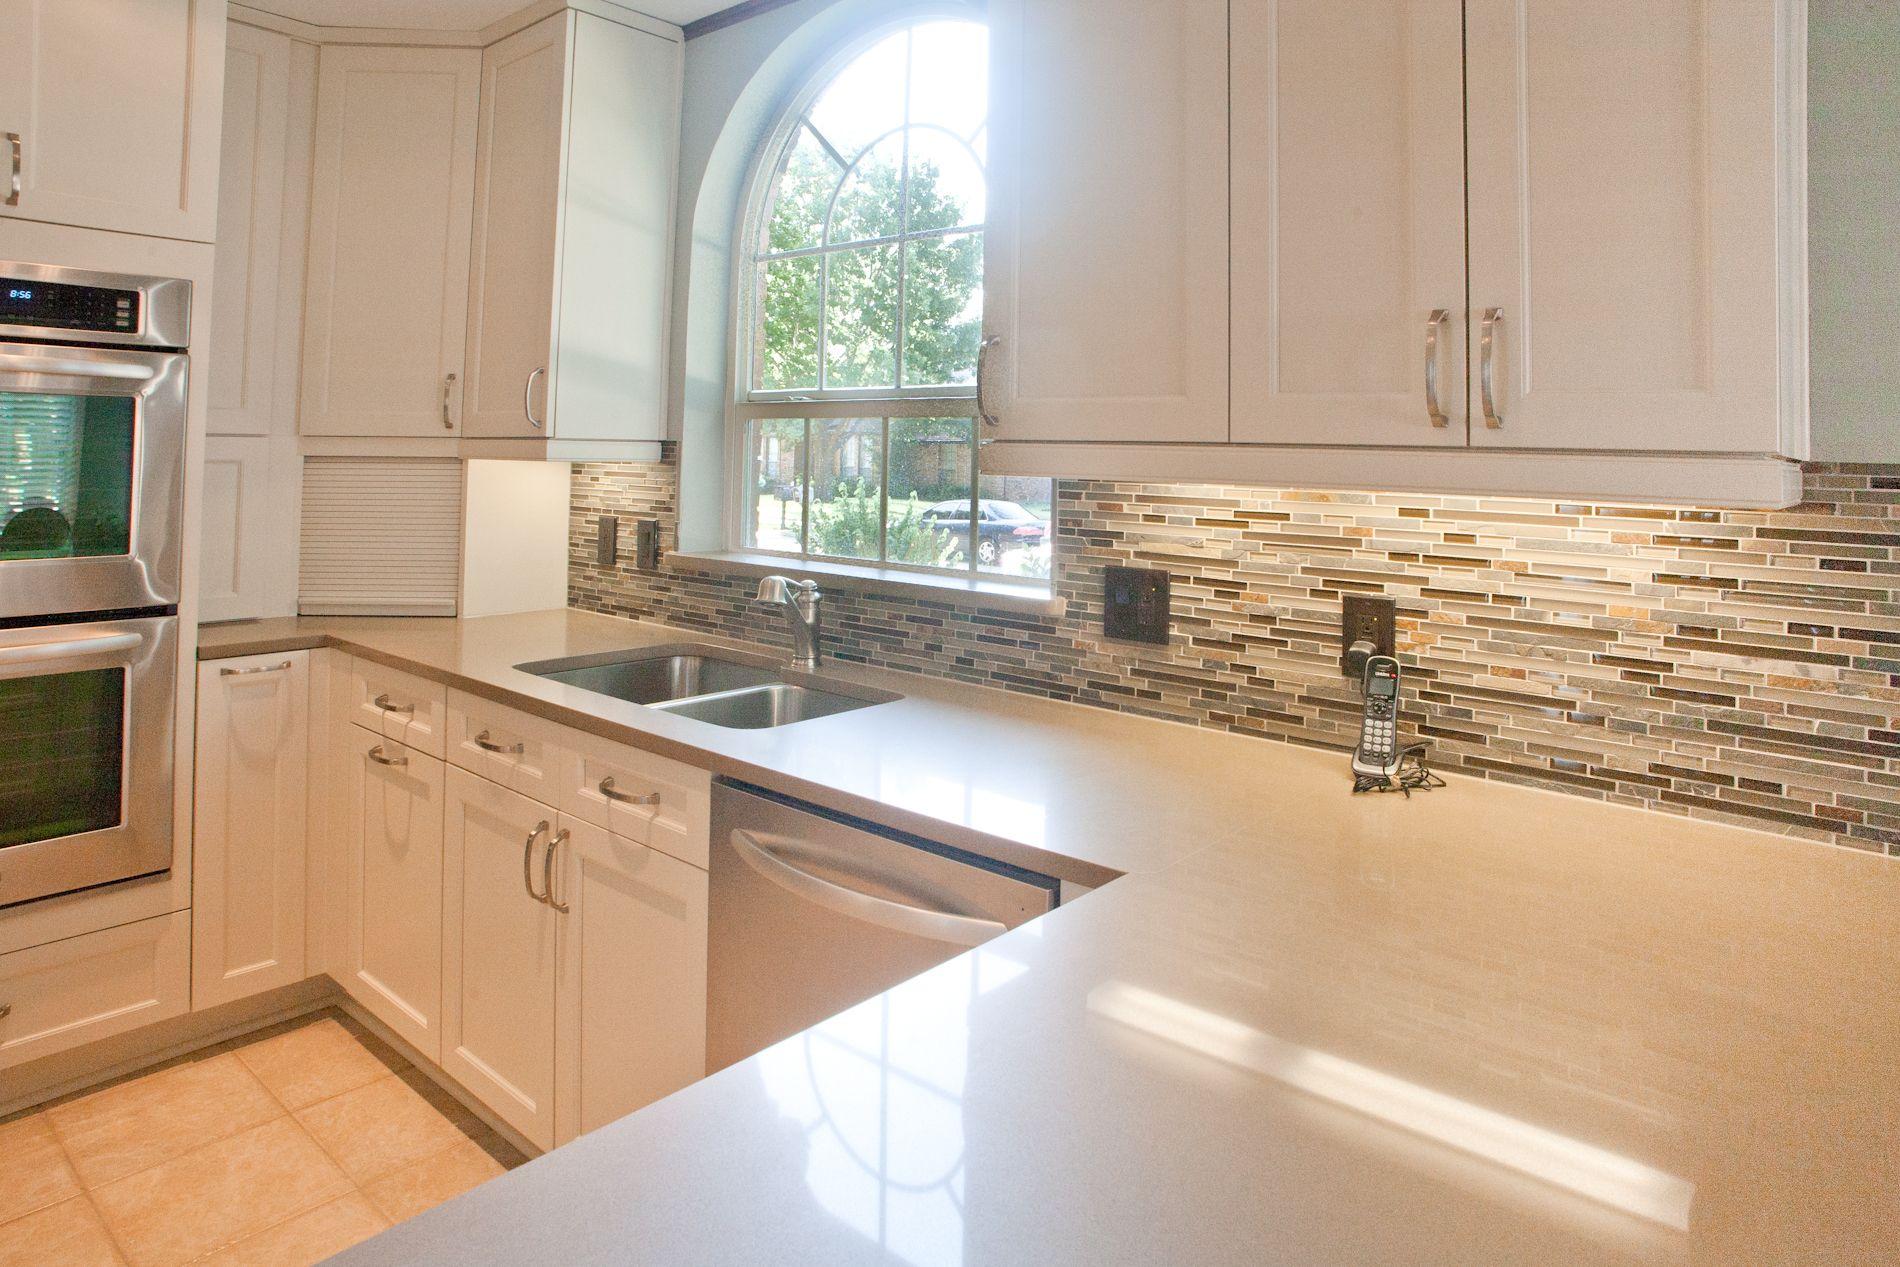 Kitchencraft Cabinets Lexington Door In Seashell Glazzio Sag